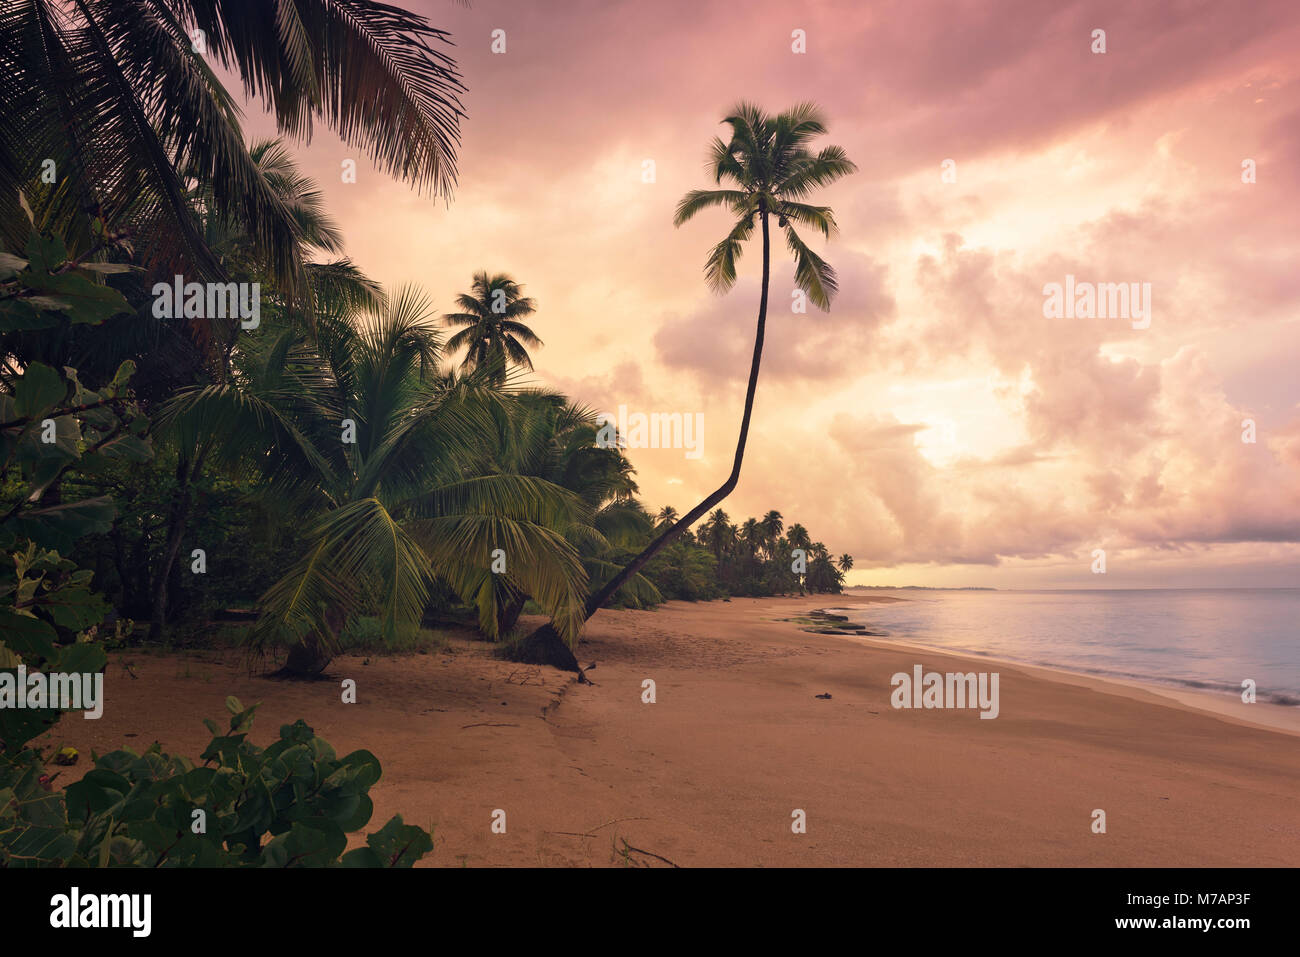 Karibischer Traum Strand in den Sonnenuntergang, Punta Vacia, Puerto Rico Stockbild